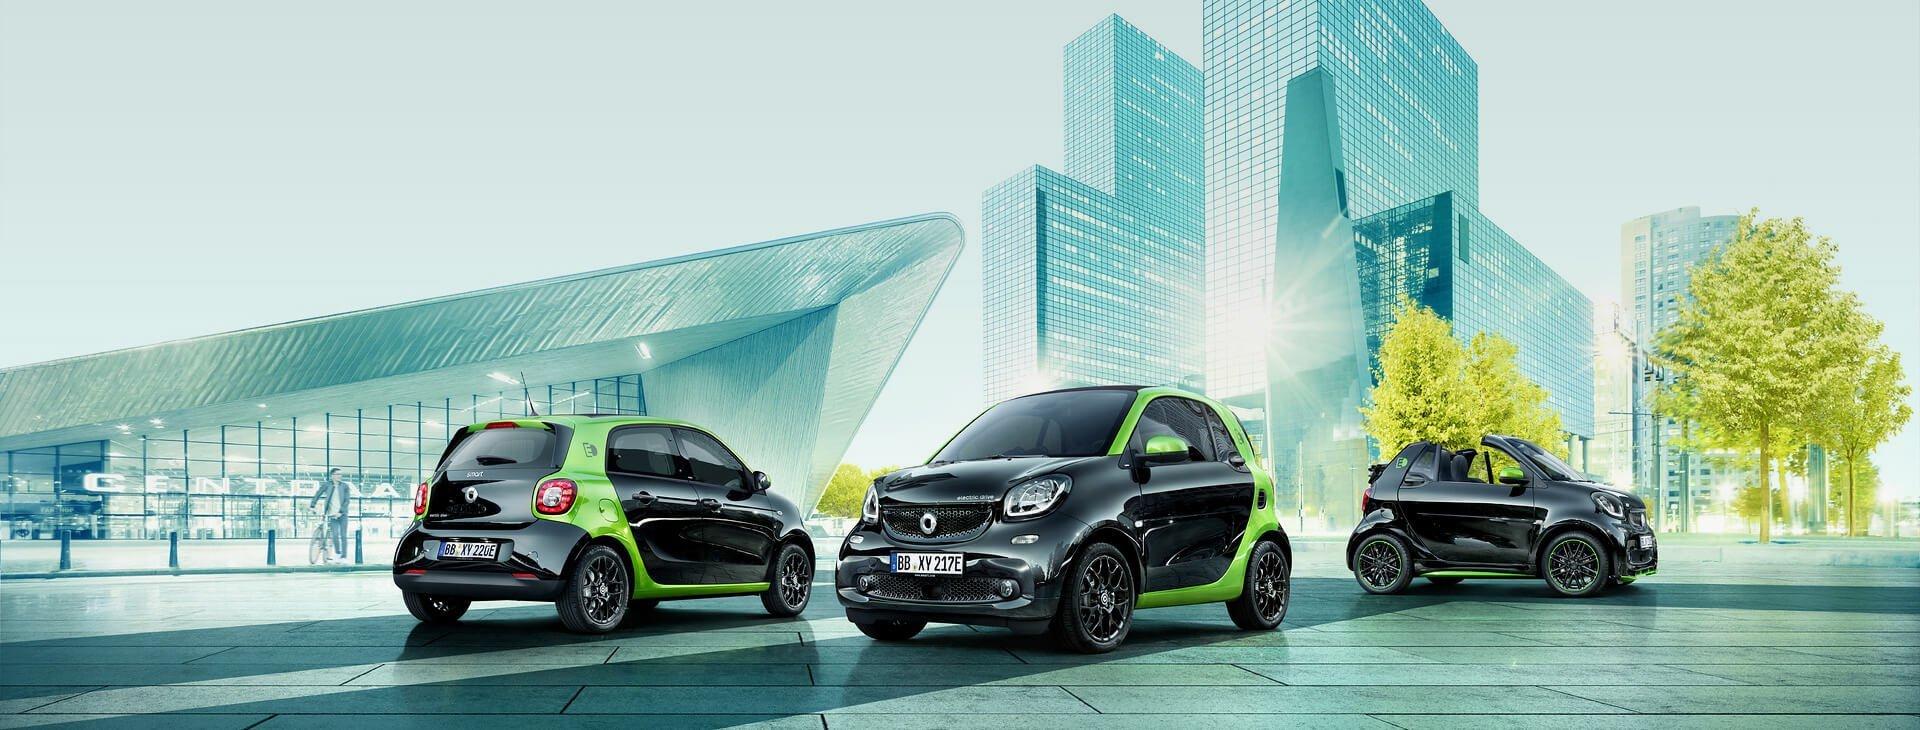 stilwerk_berlin_smart_electric_drive_stage